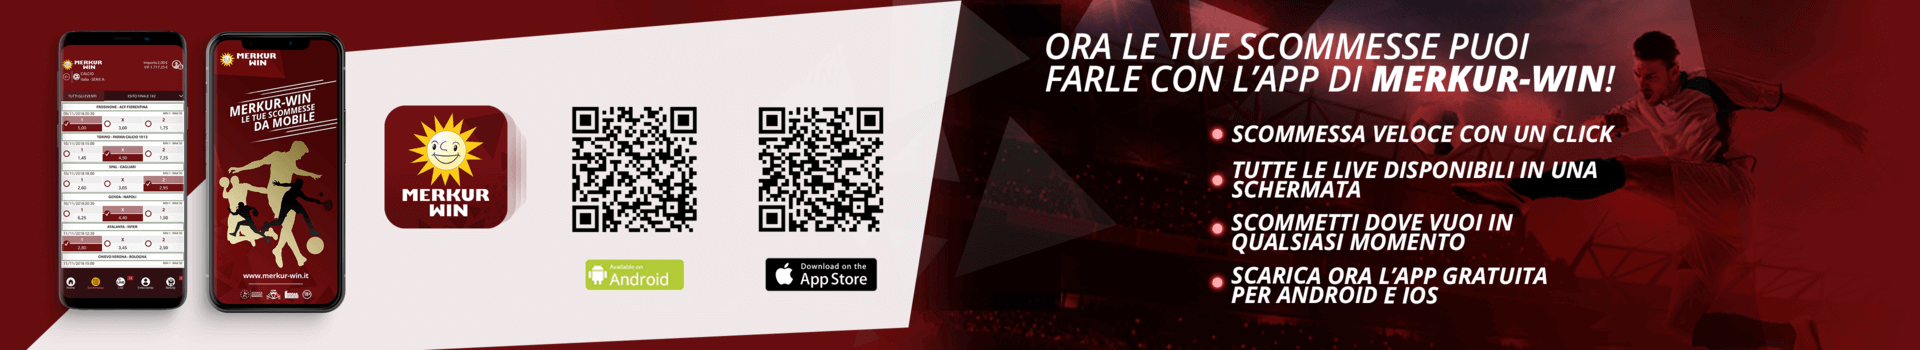 merkurwin mobile app